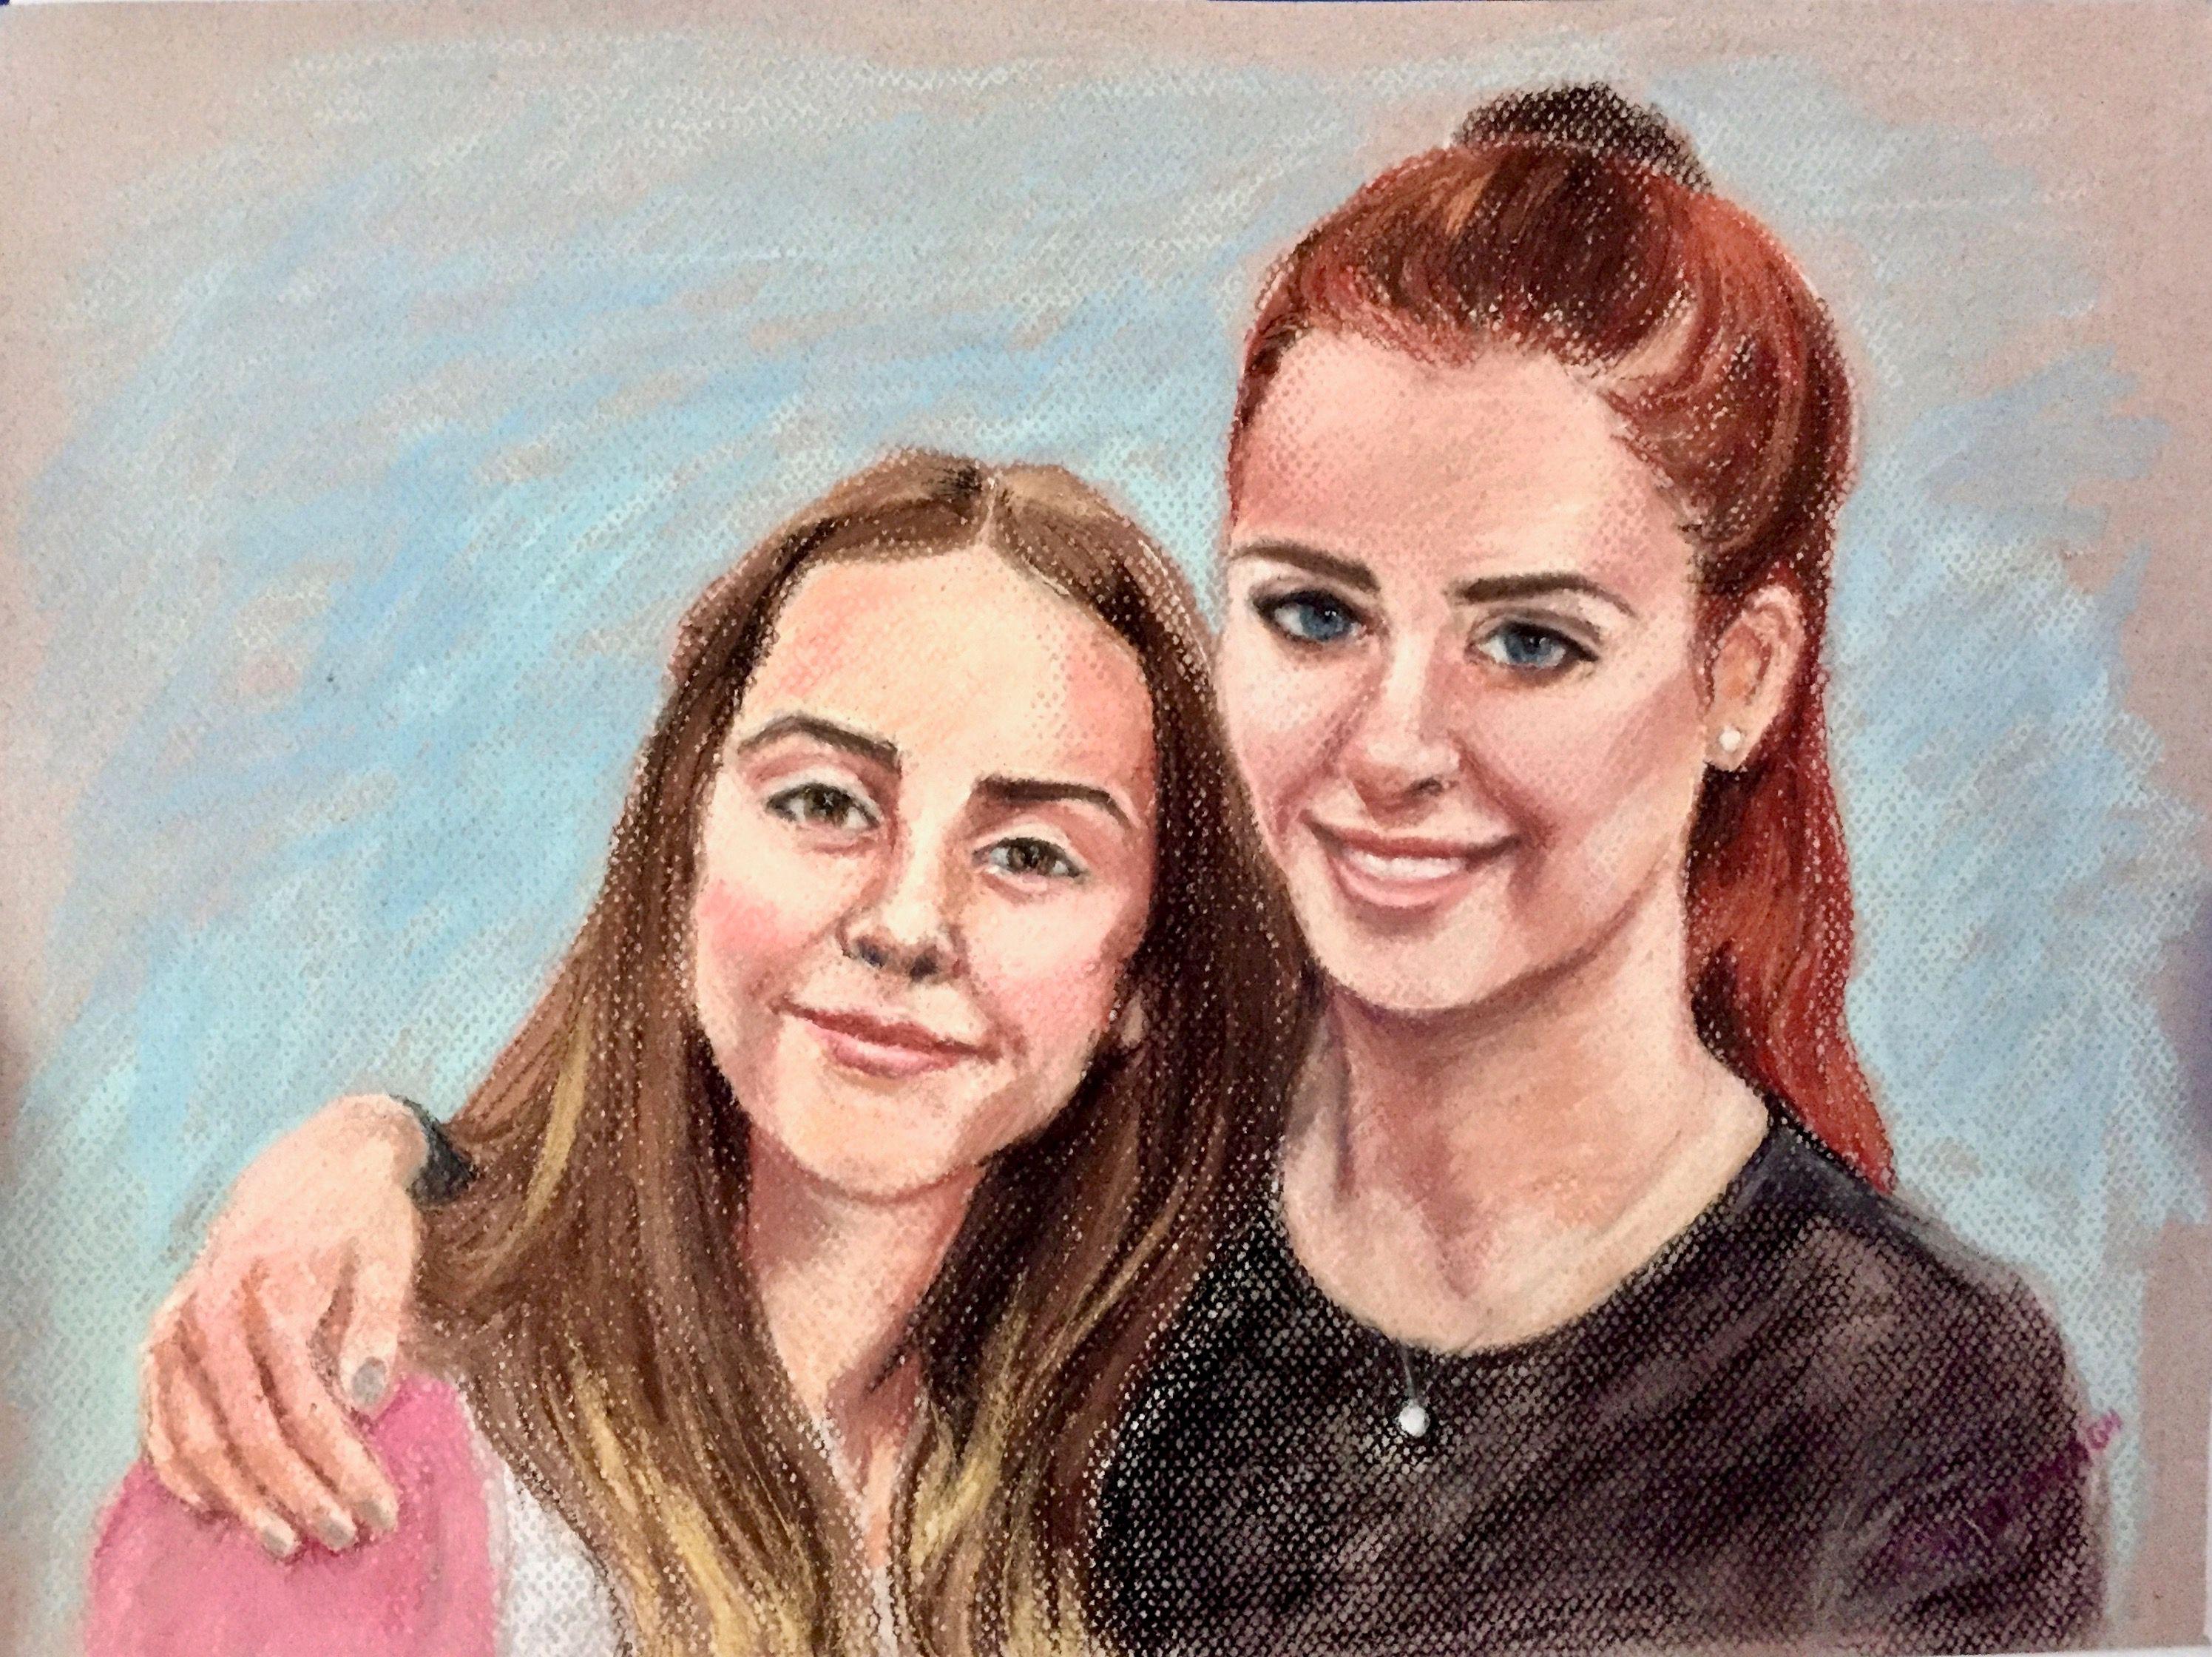 Artist: Christine MacDonagh, Pastel on Paper